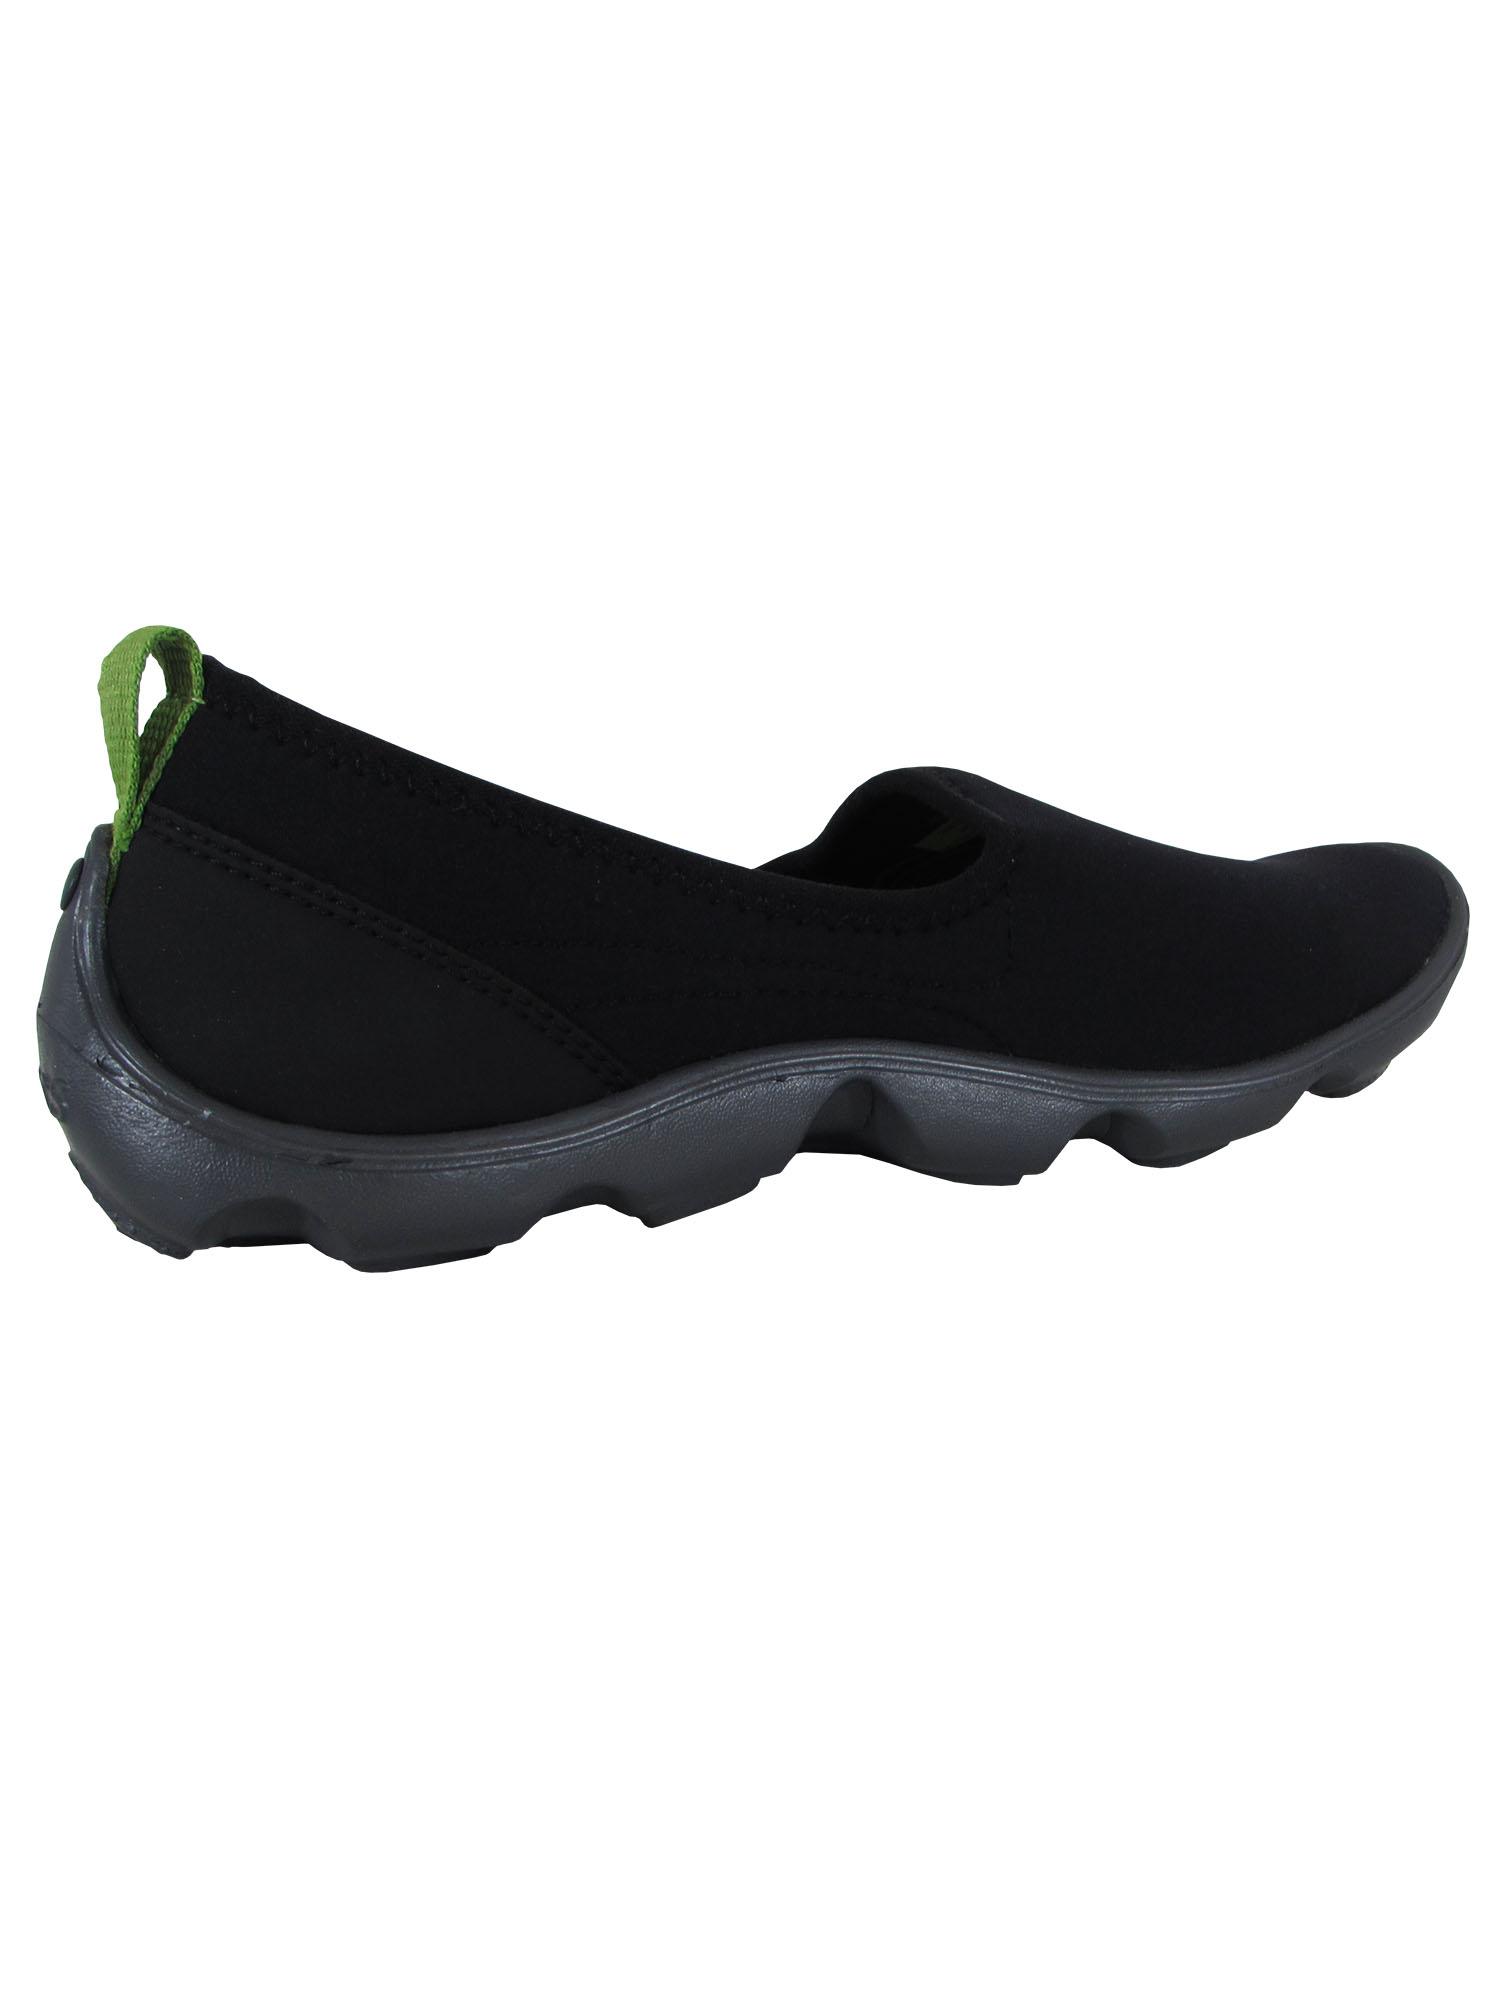 Crocs-Womens-Duet-Busy-Day-Skimmer-Flat-Shoes thumbnail 4